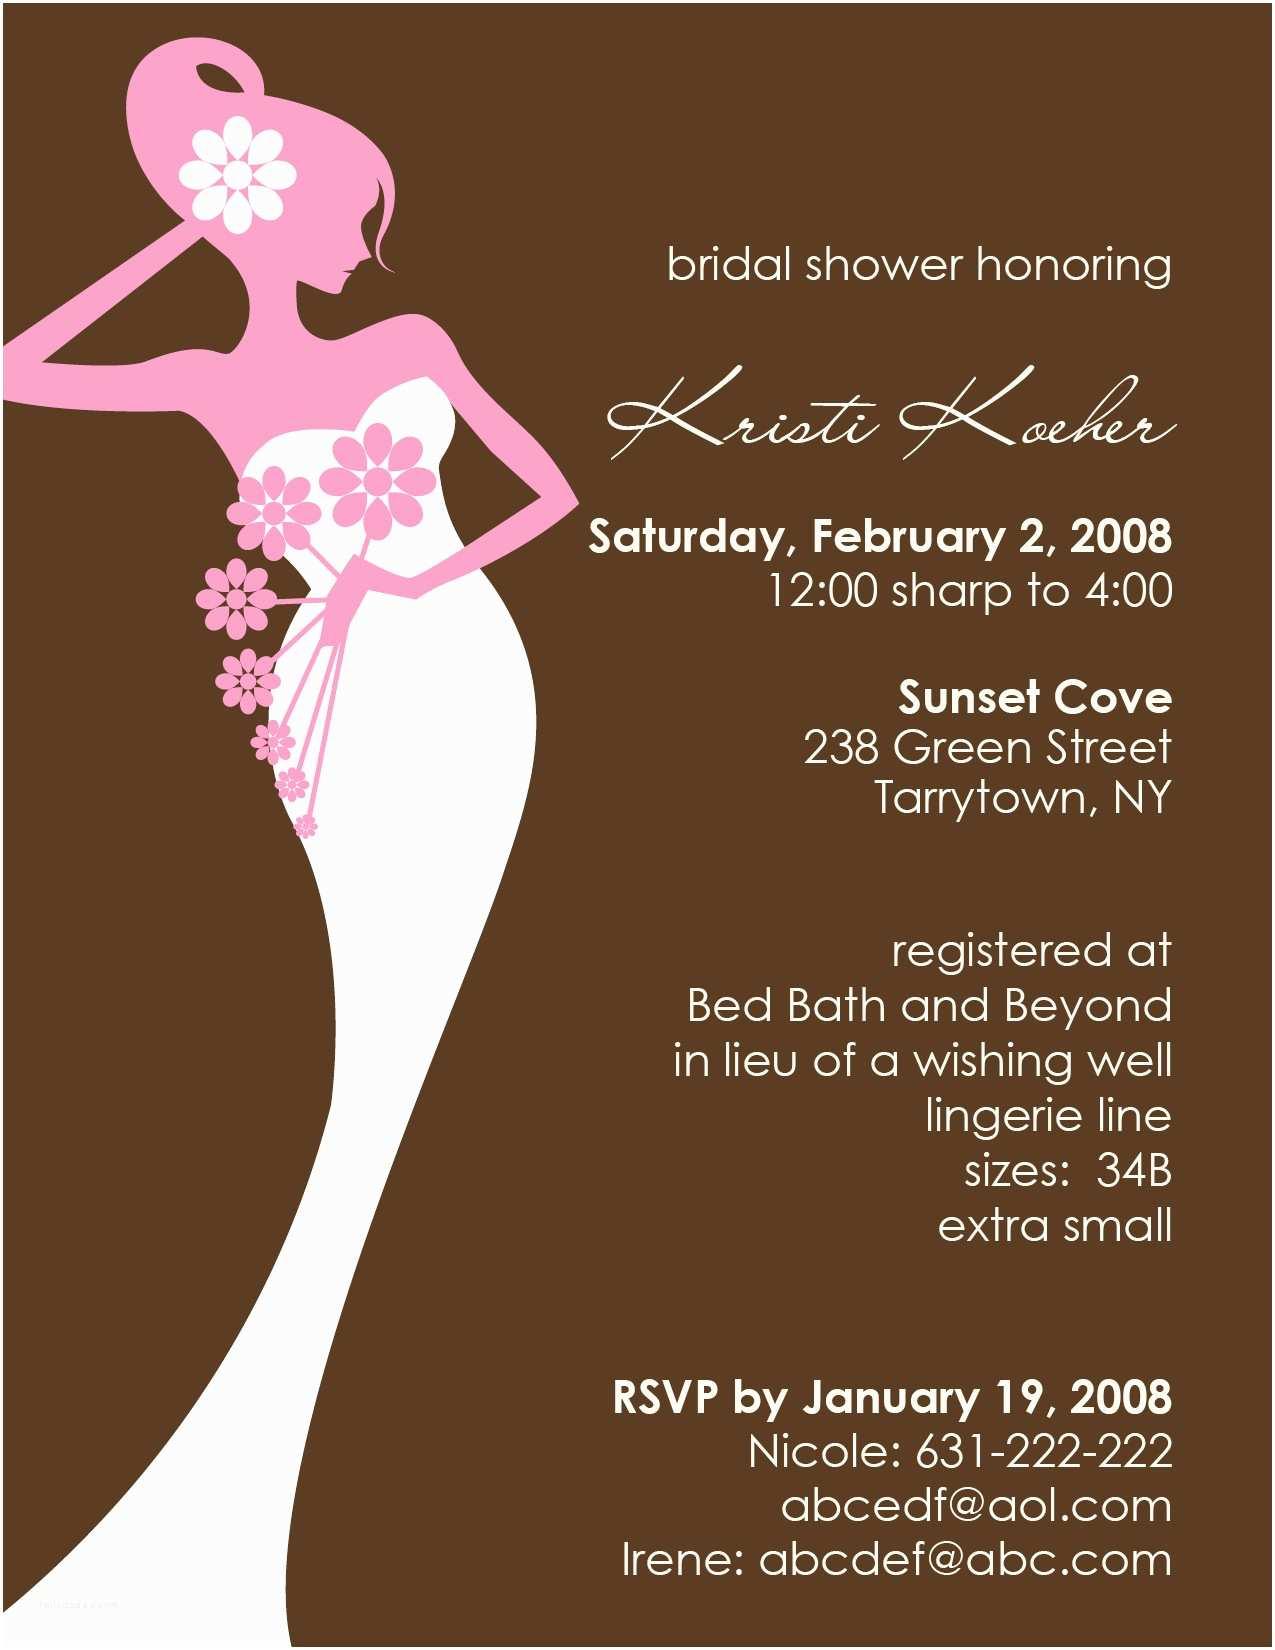 Online Bridal Shower Invitations Bridal Shower Invitations 00a1a8